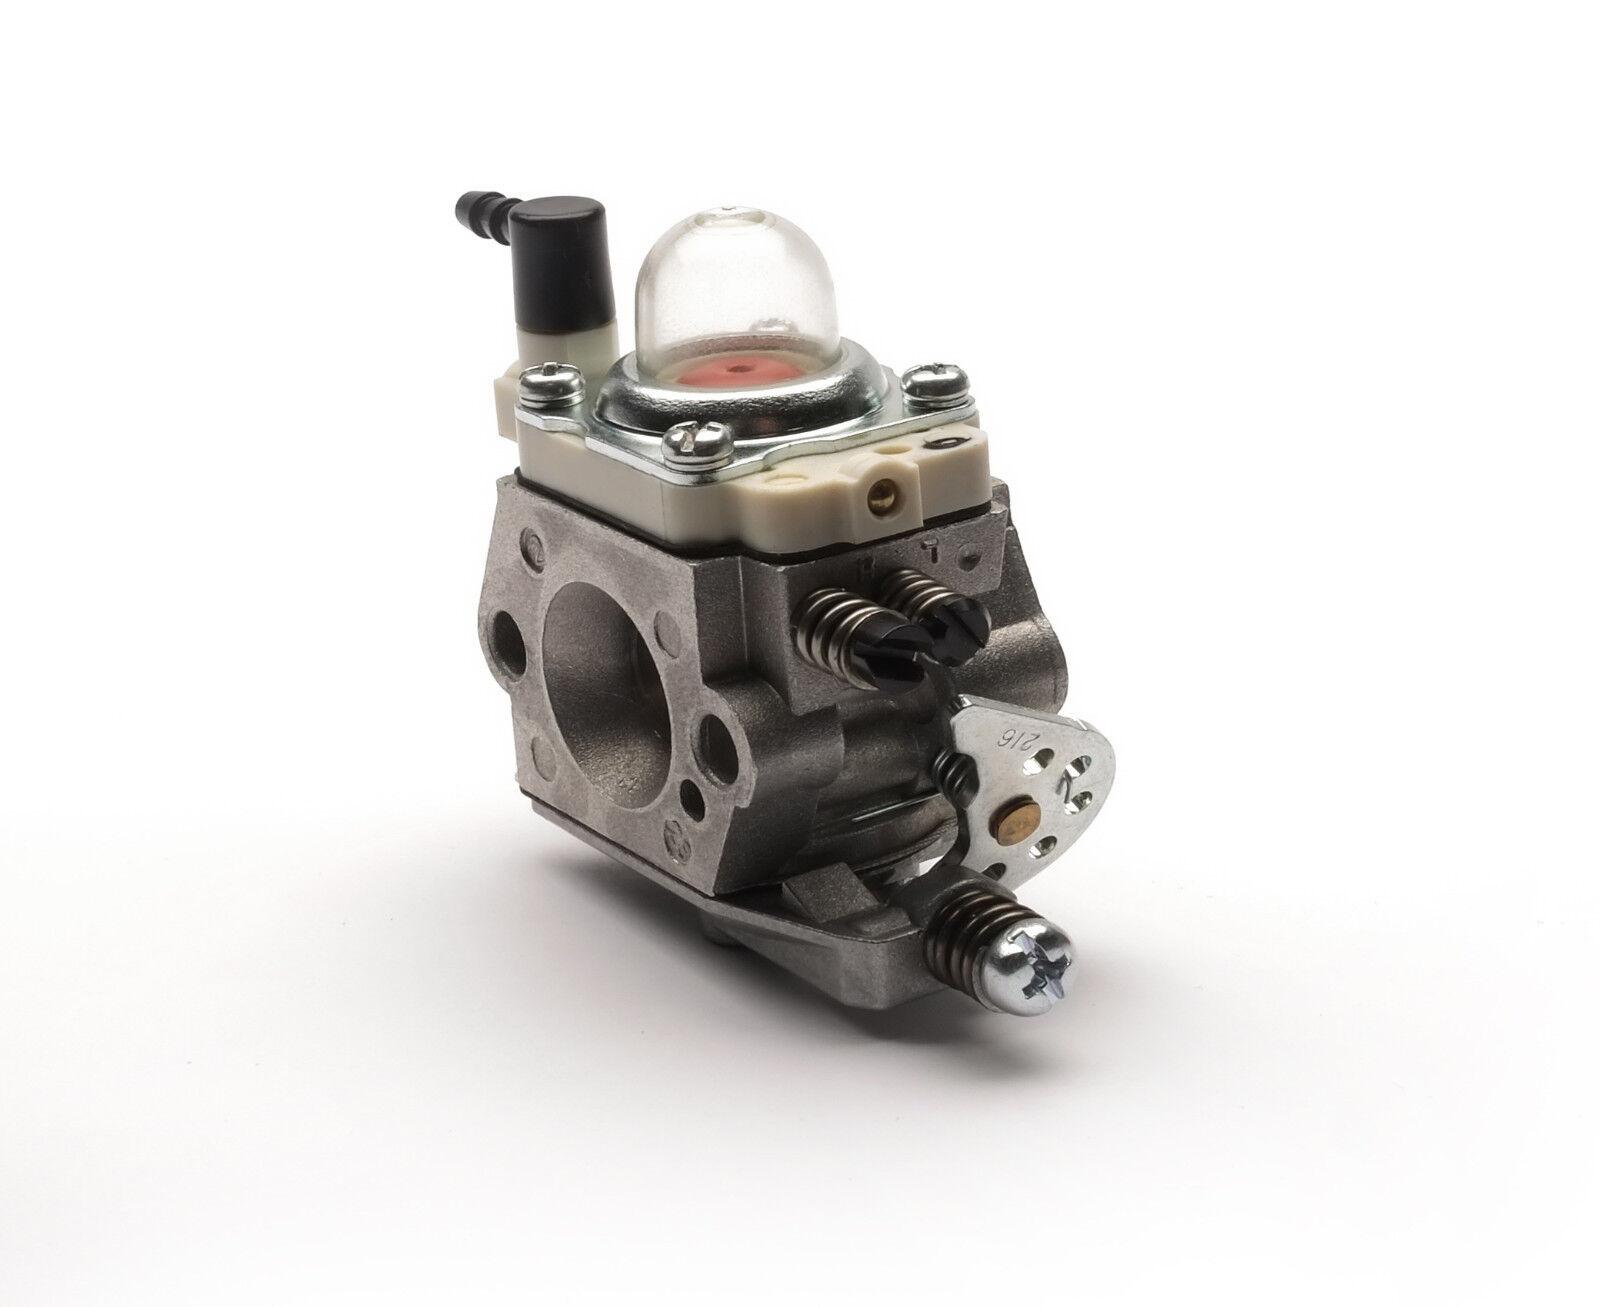 Original walbro wt-990 High Performance Tuning carburador para Zenoah motor